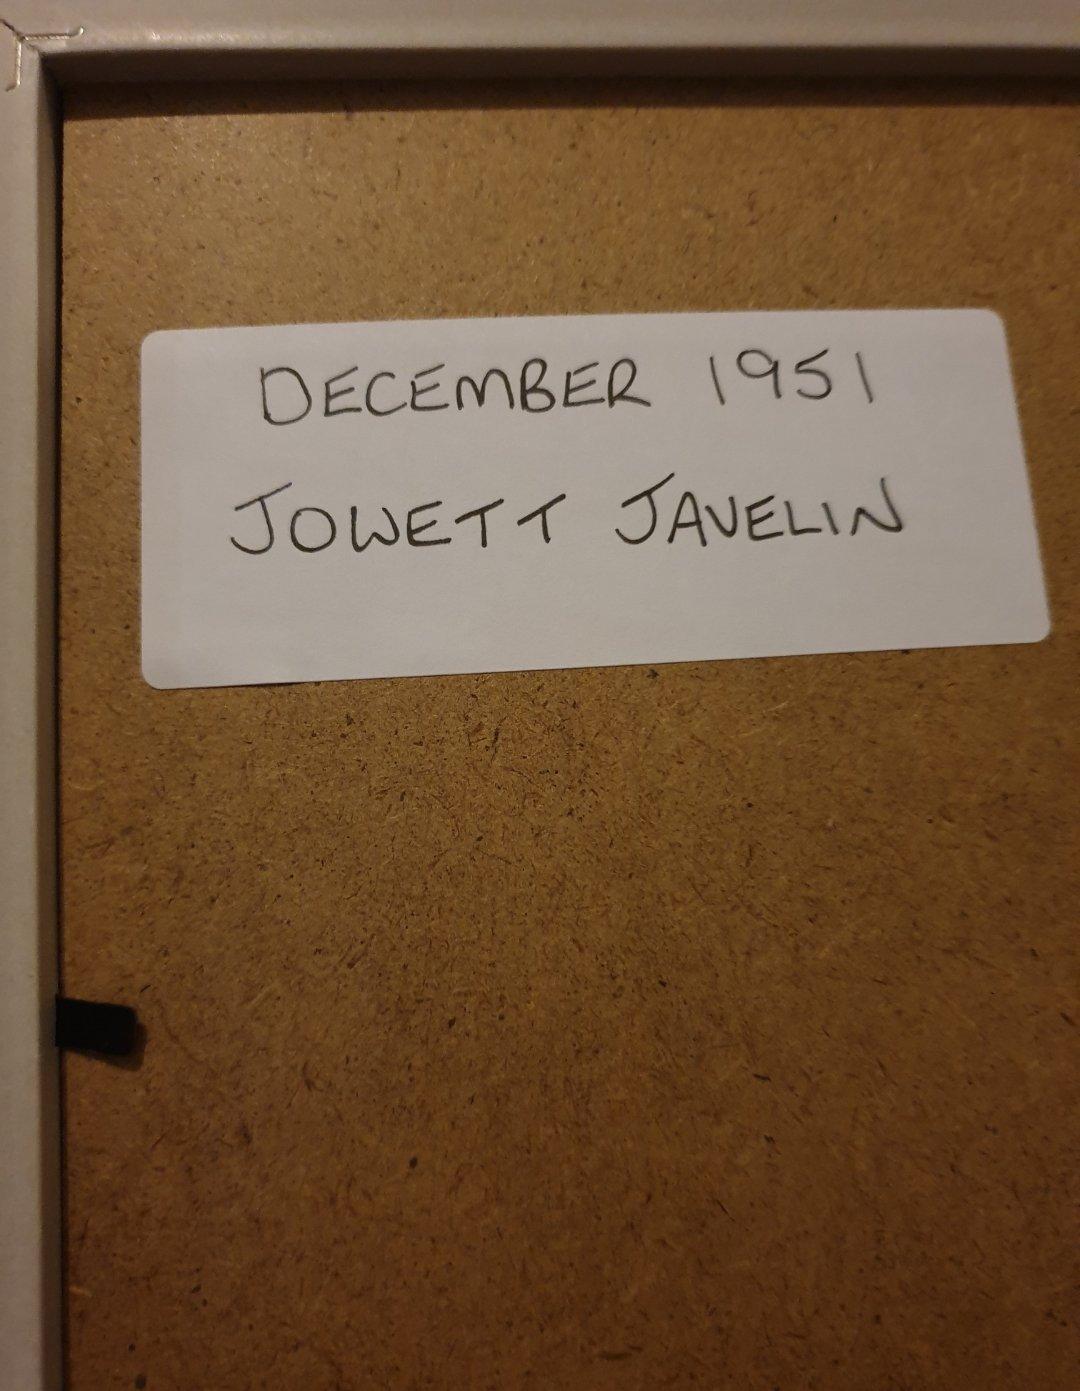 1951 Jowett Javelin Advert Original  For Sale (picture 2 of 2)